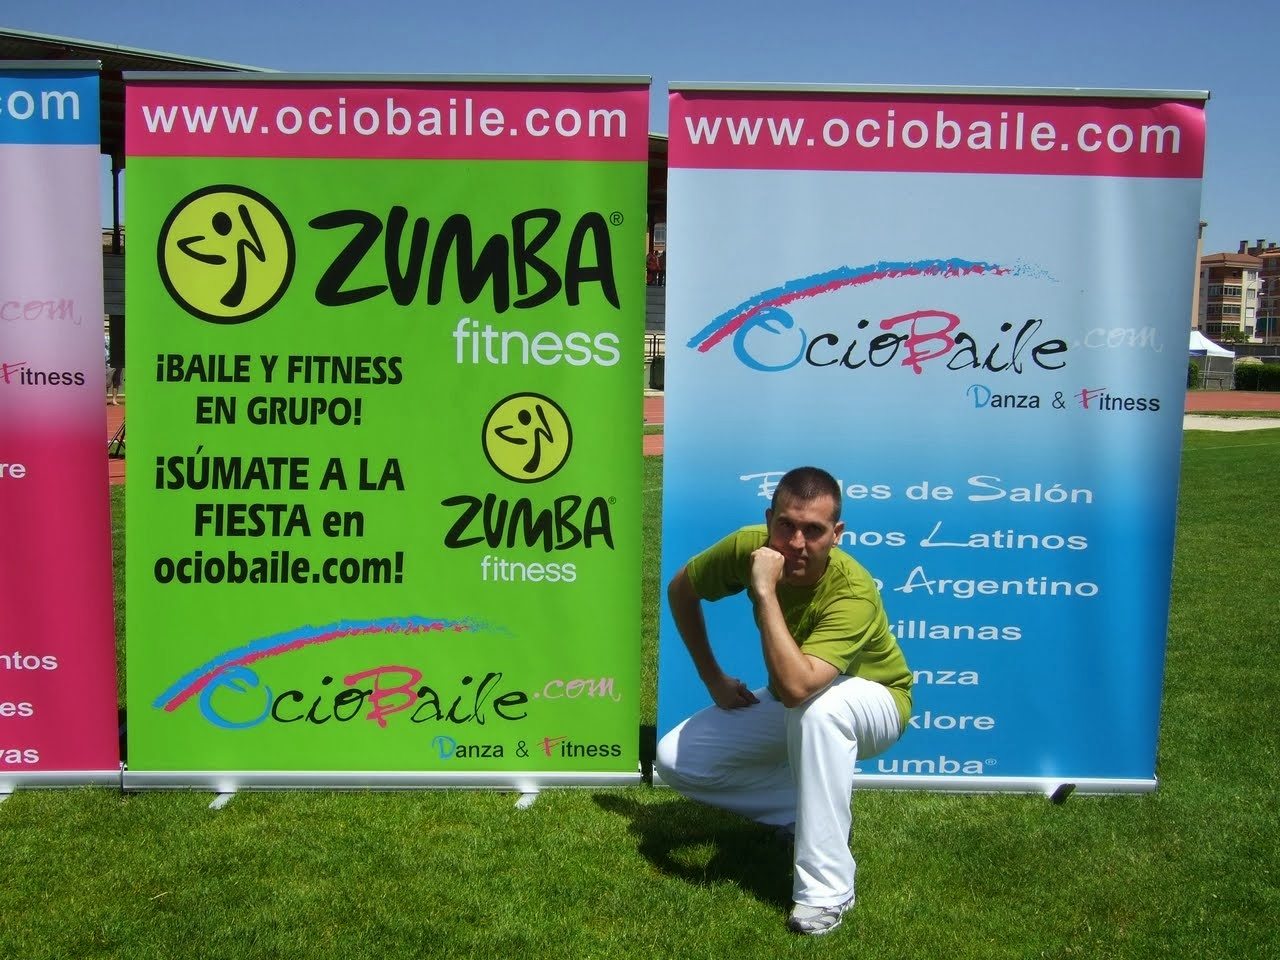 Zumba ® Segovia Ociobaile